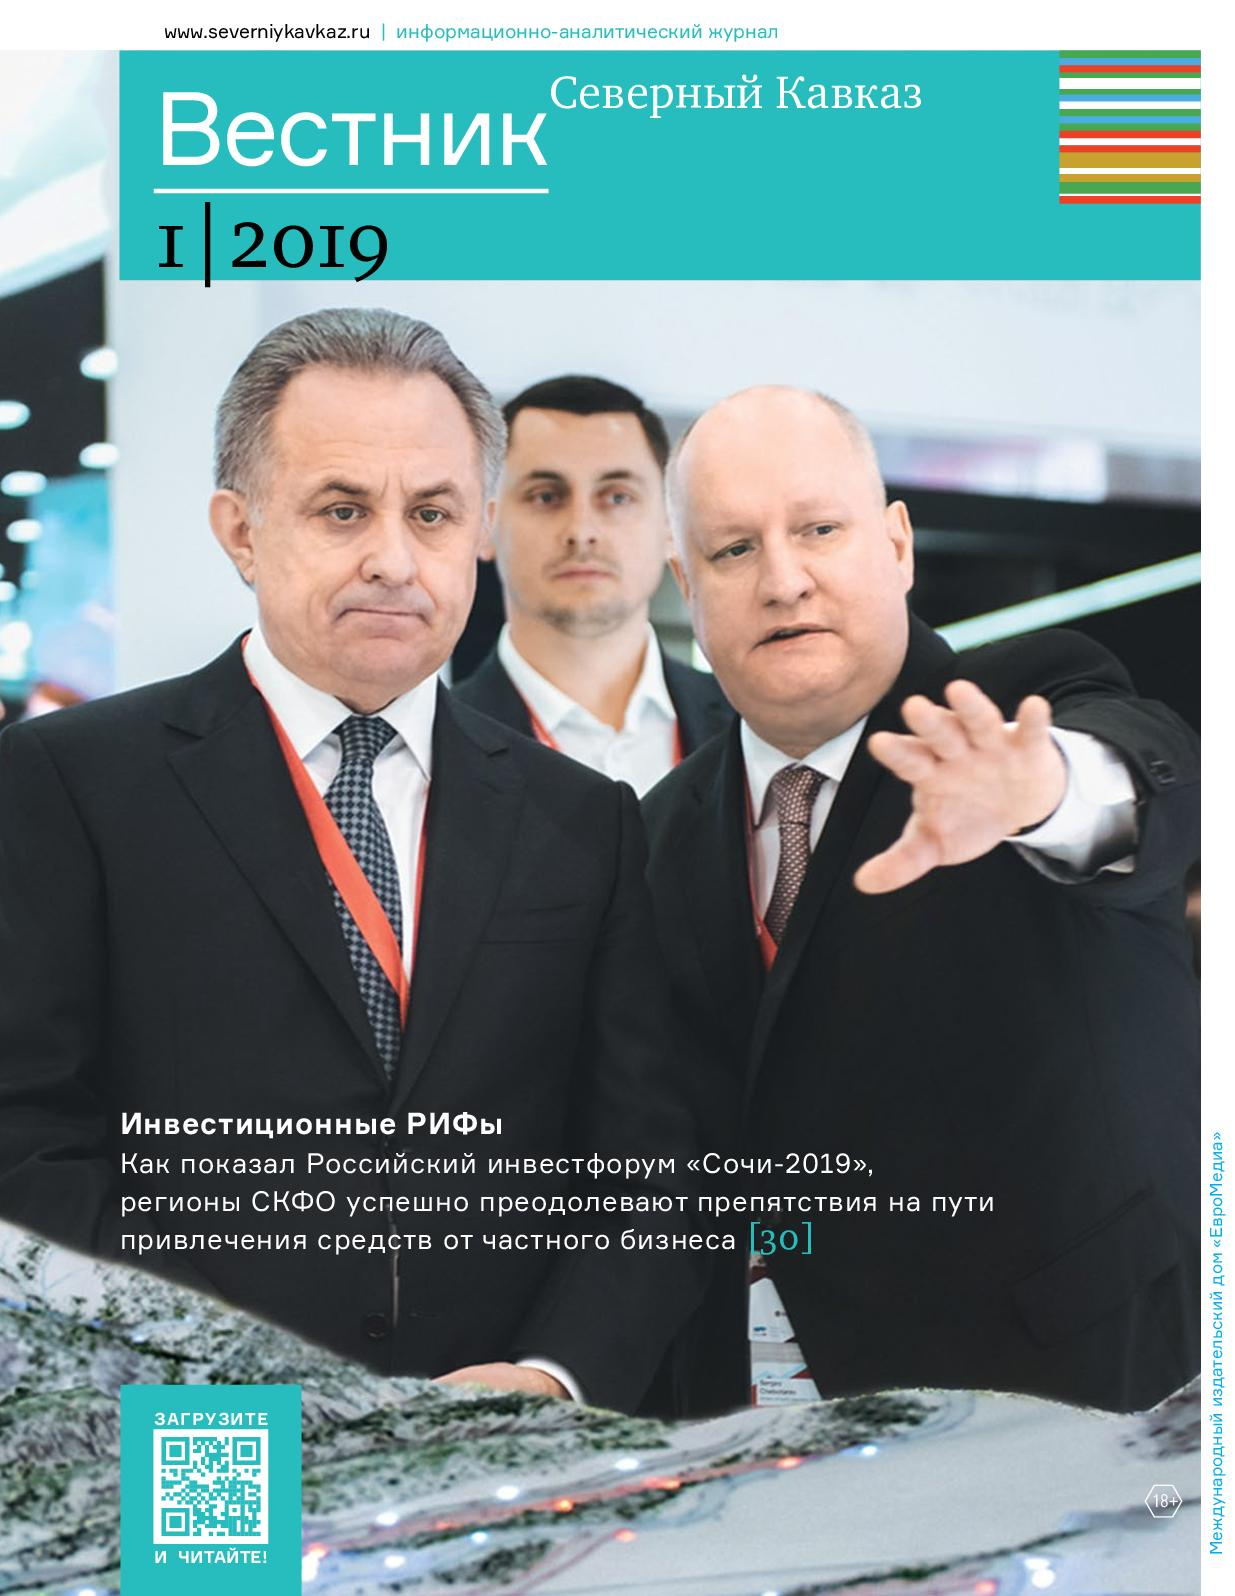 банк санкт петербург взять кредитную карту